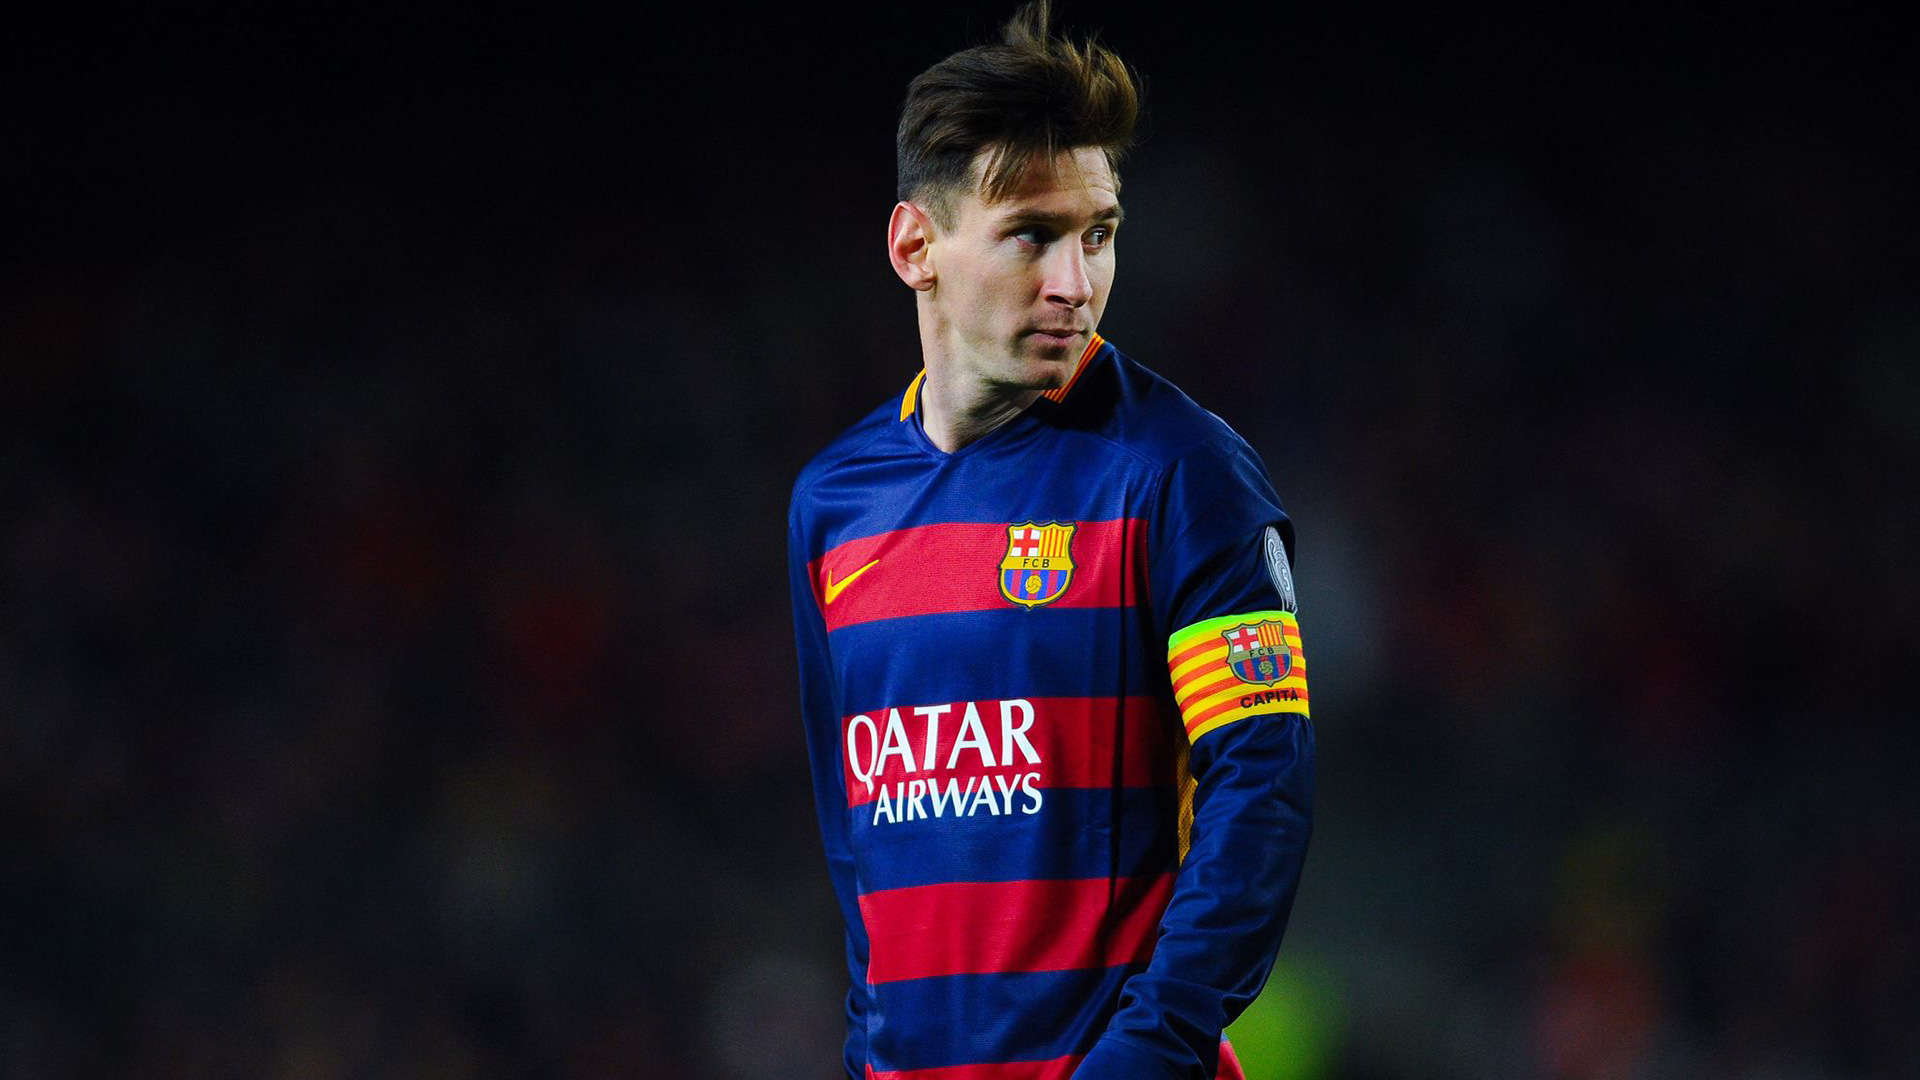 Tags 2016 Lionel Messi Football Leo Messi Lionel Messi Male 1920x1080